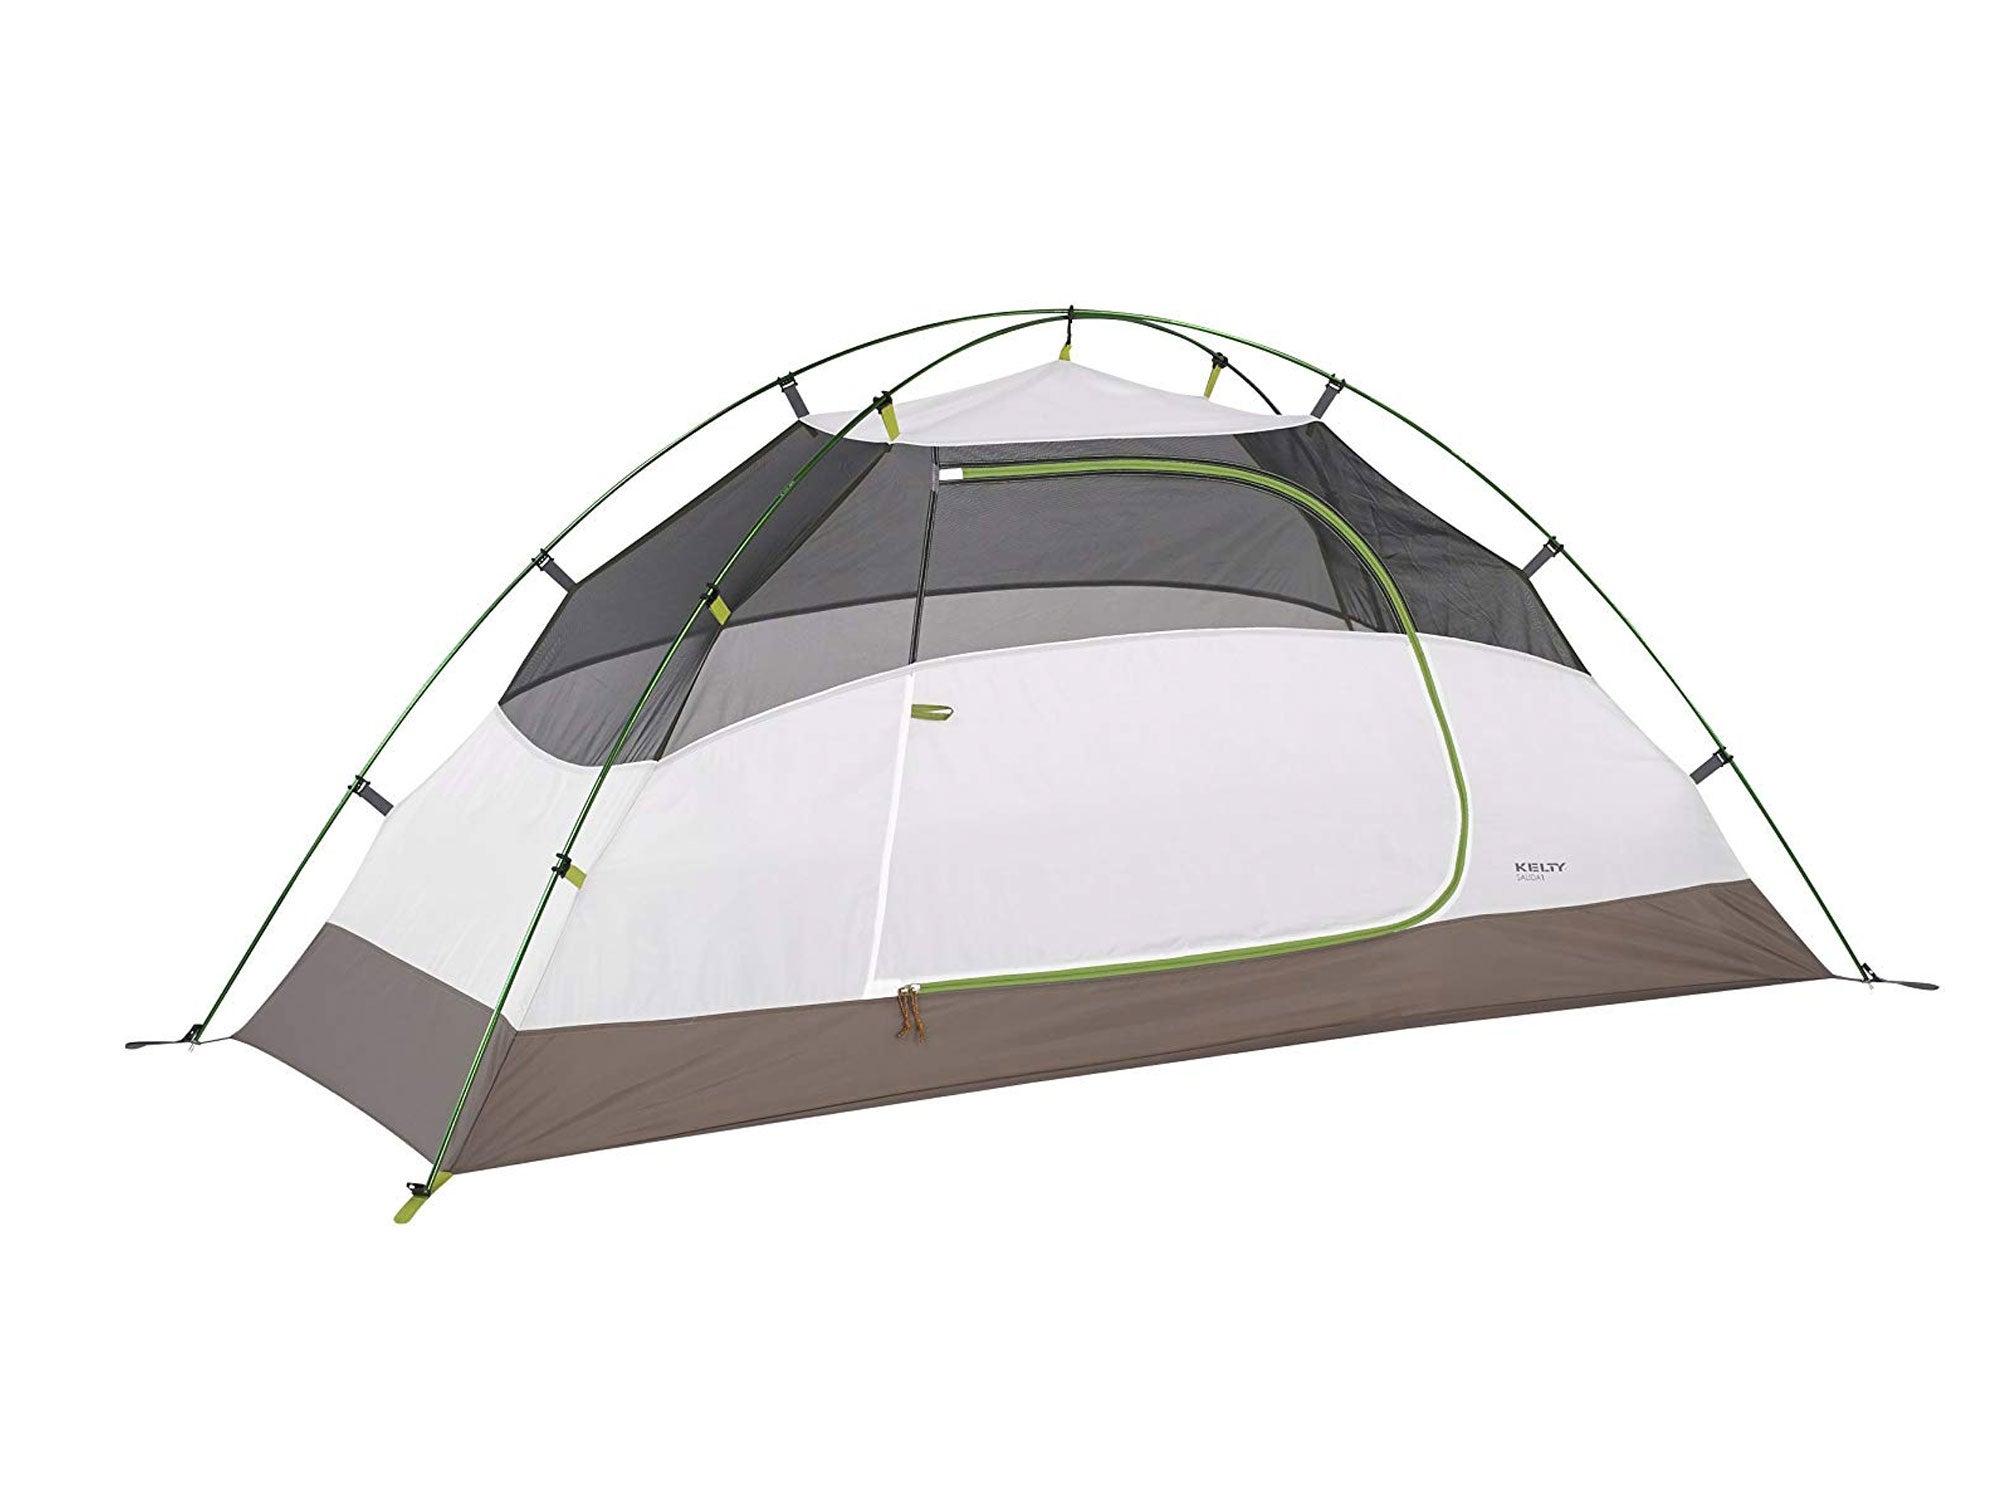 Kelty Salida Camping and Backpacking Tent